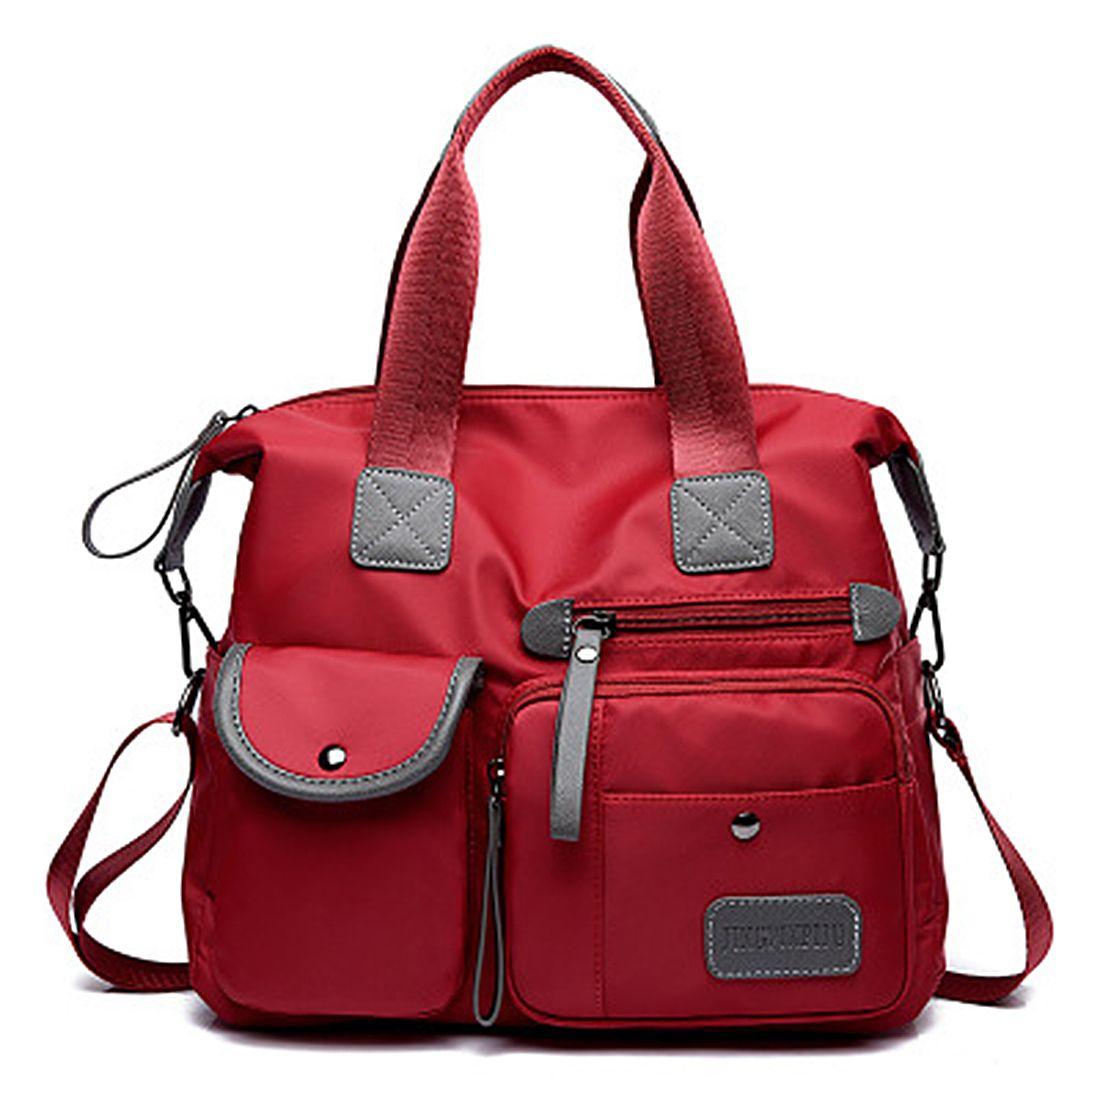 DCOS New Ladies Fashion Waterproof Oxford Tote Bag Casual Nylon Shoulder Bag Mummy Bag Large Capacity Canvas Bag